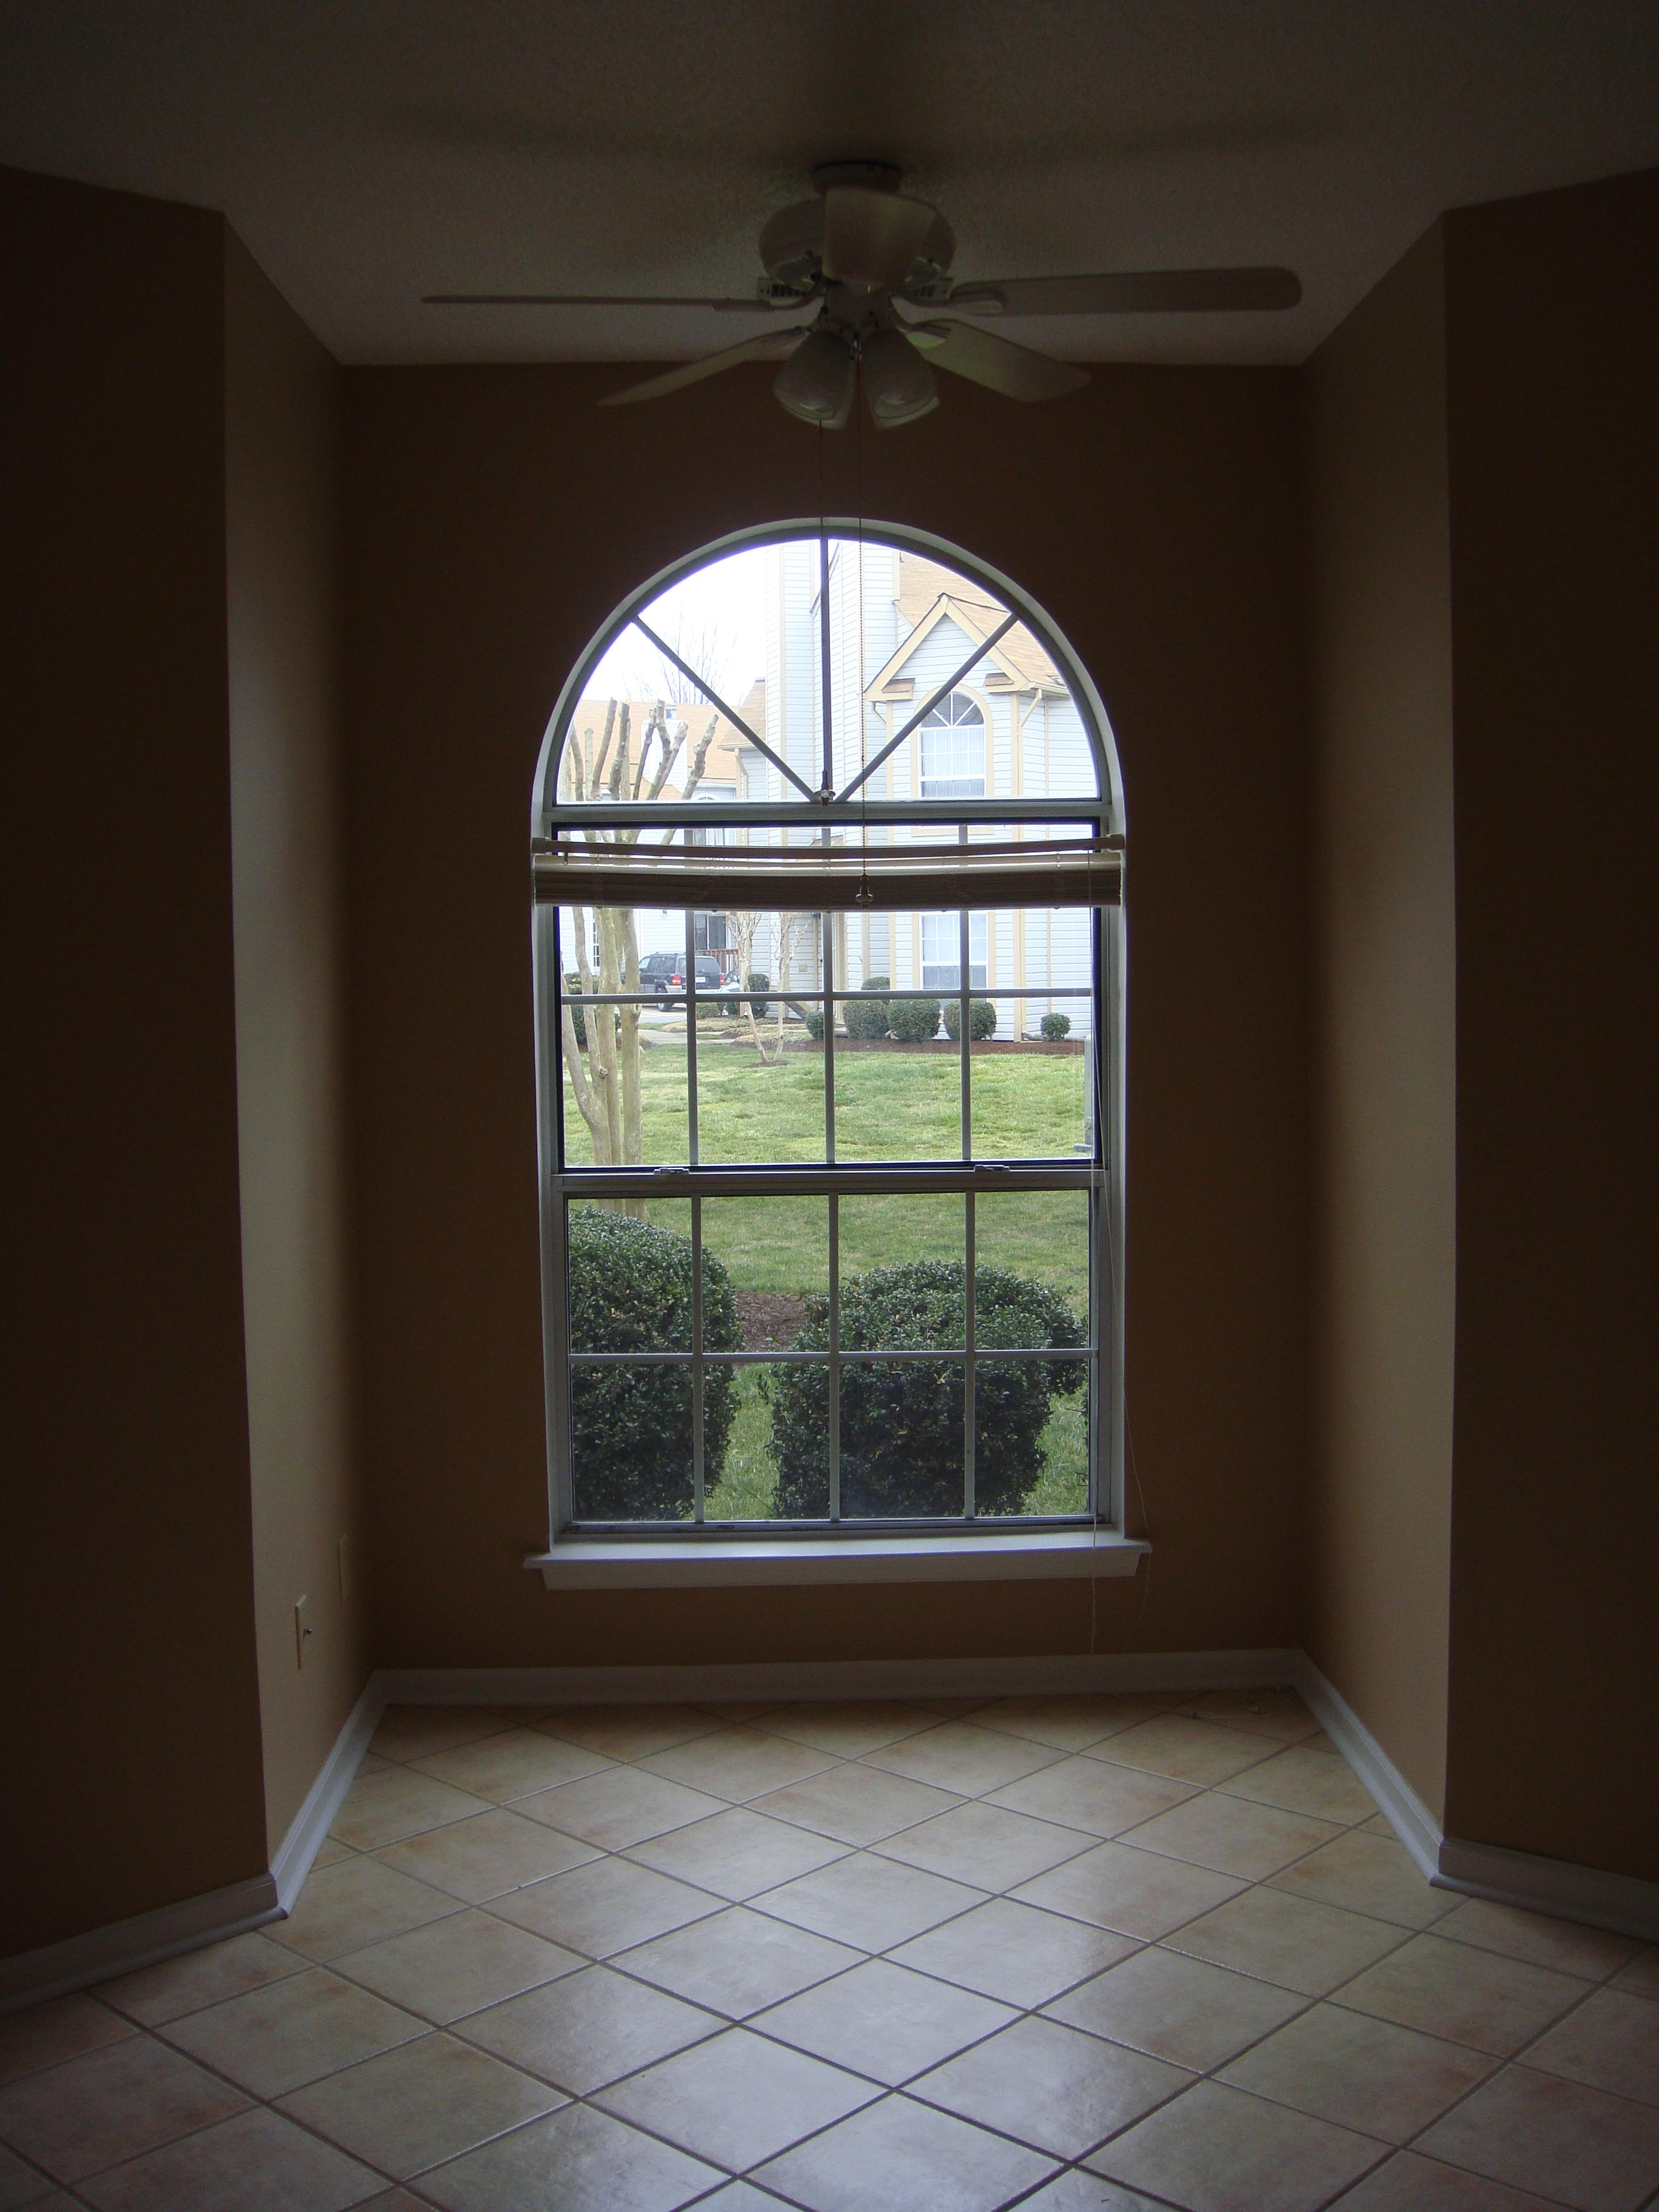 Big windows with half circle windows